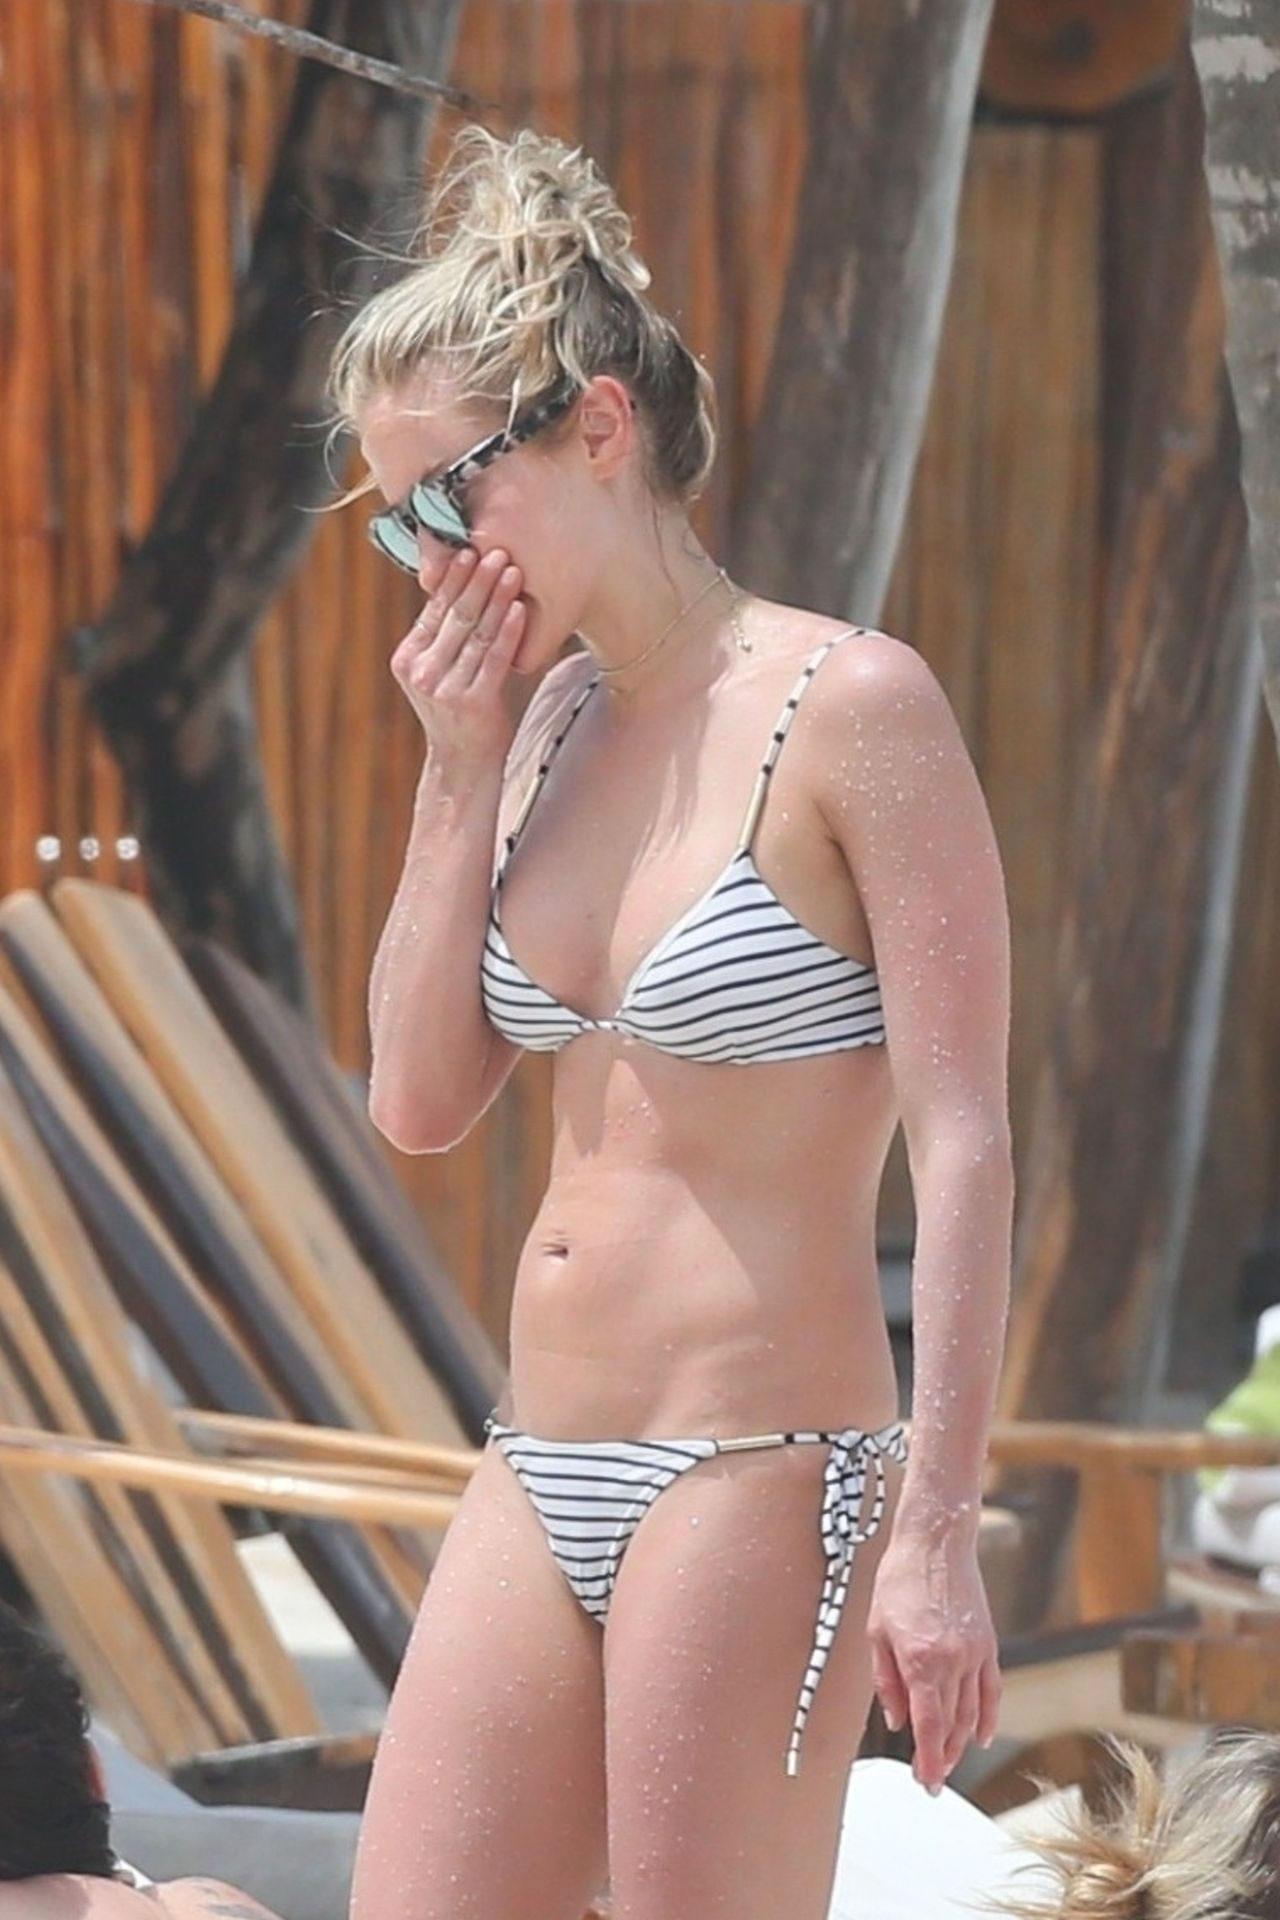 Kristin Cavallari's Striped Bikini Photos - Barnorama